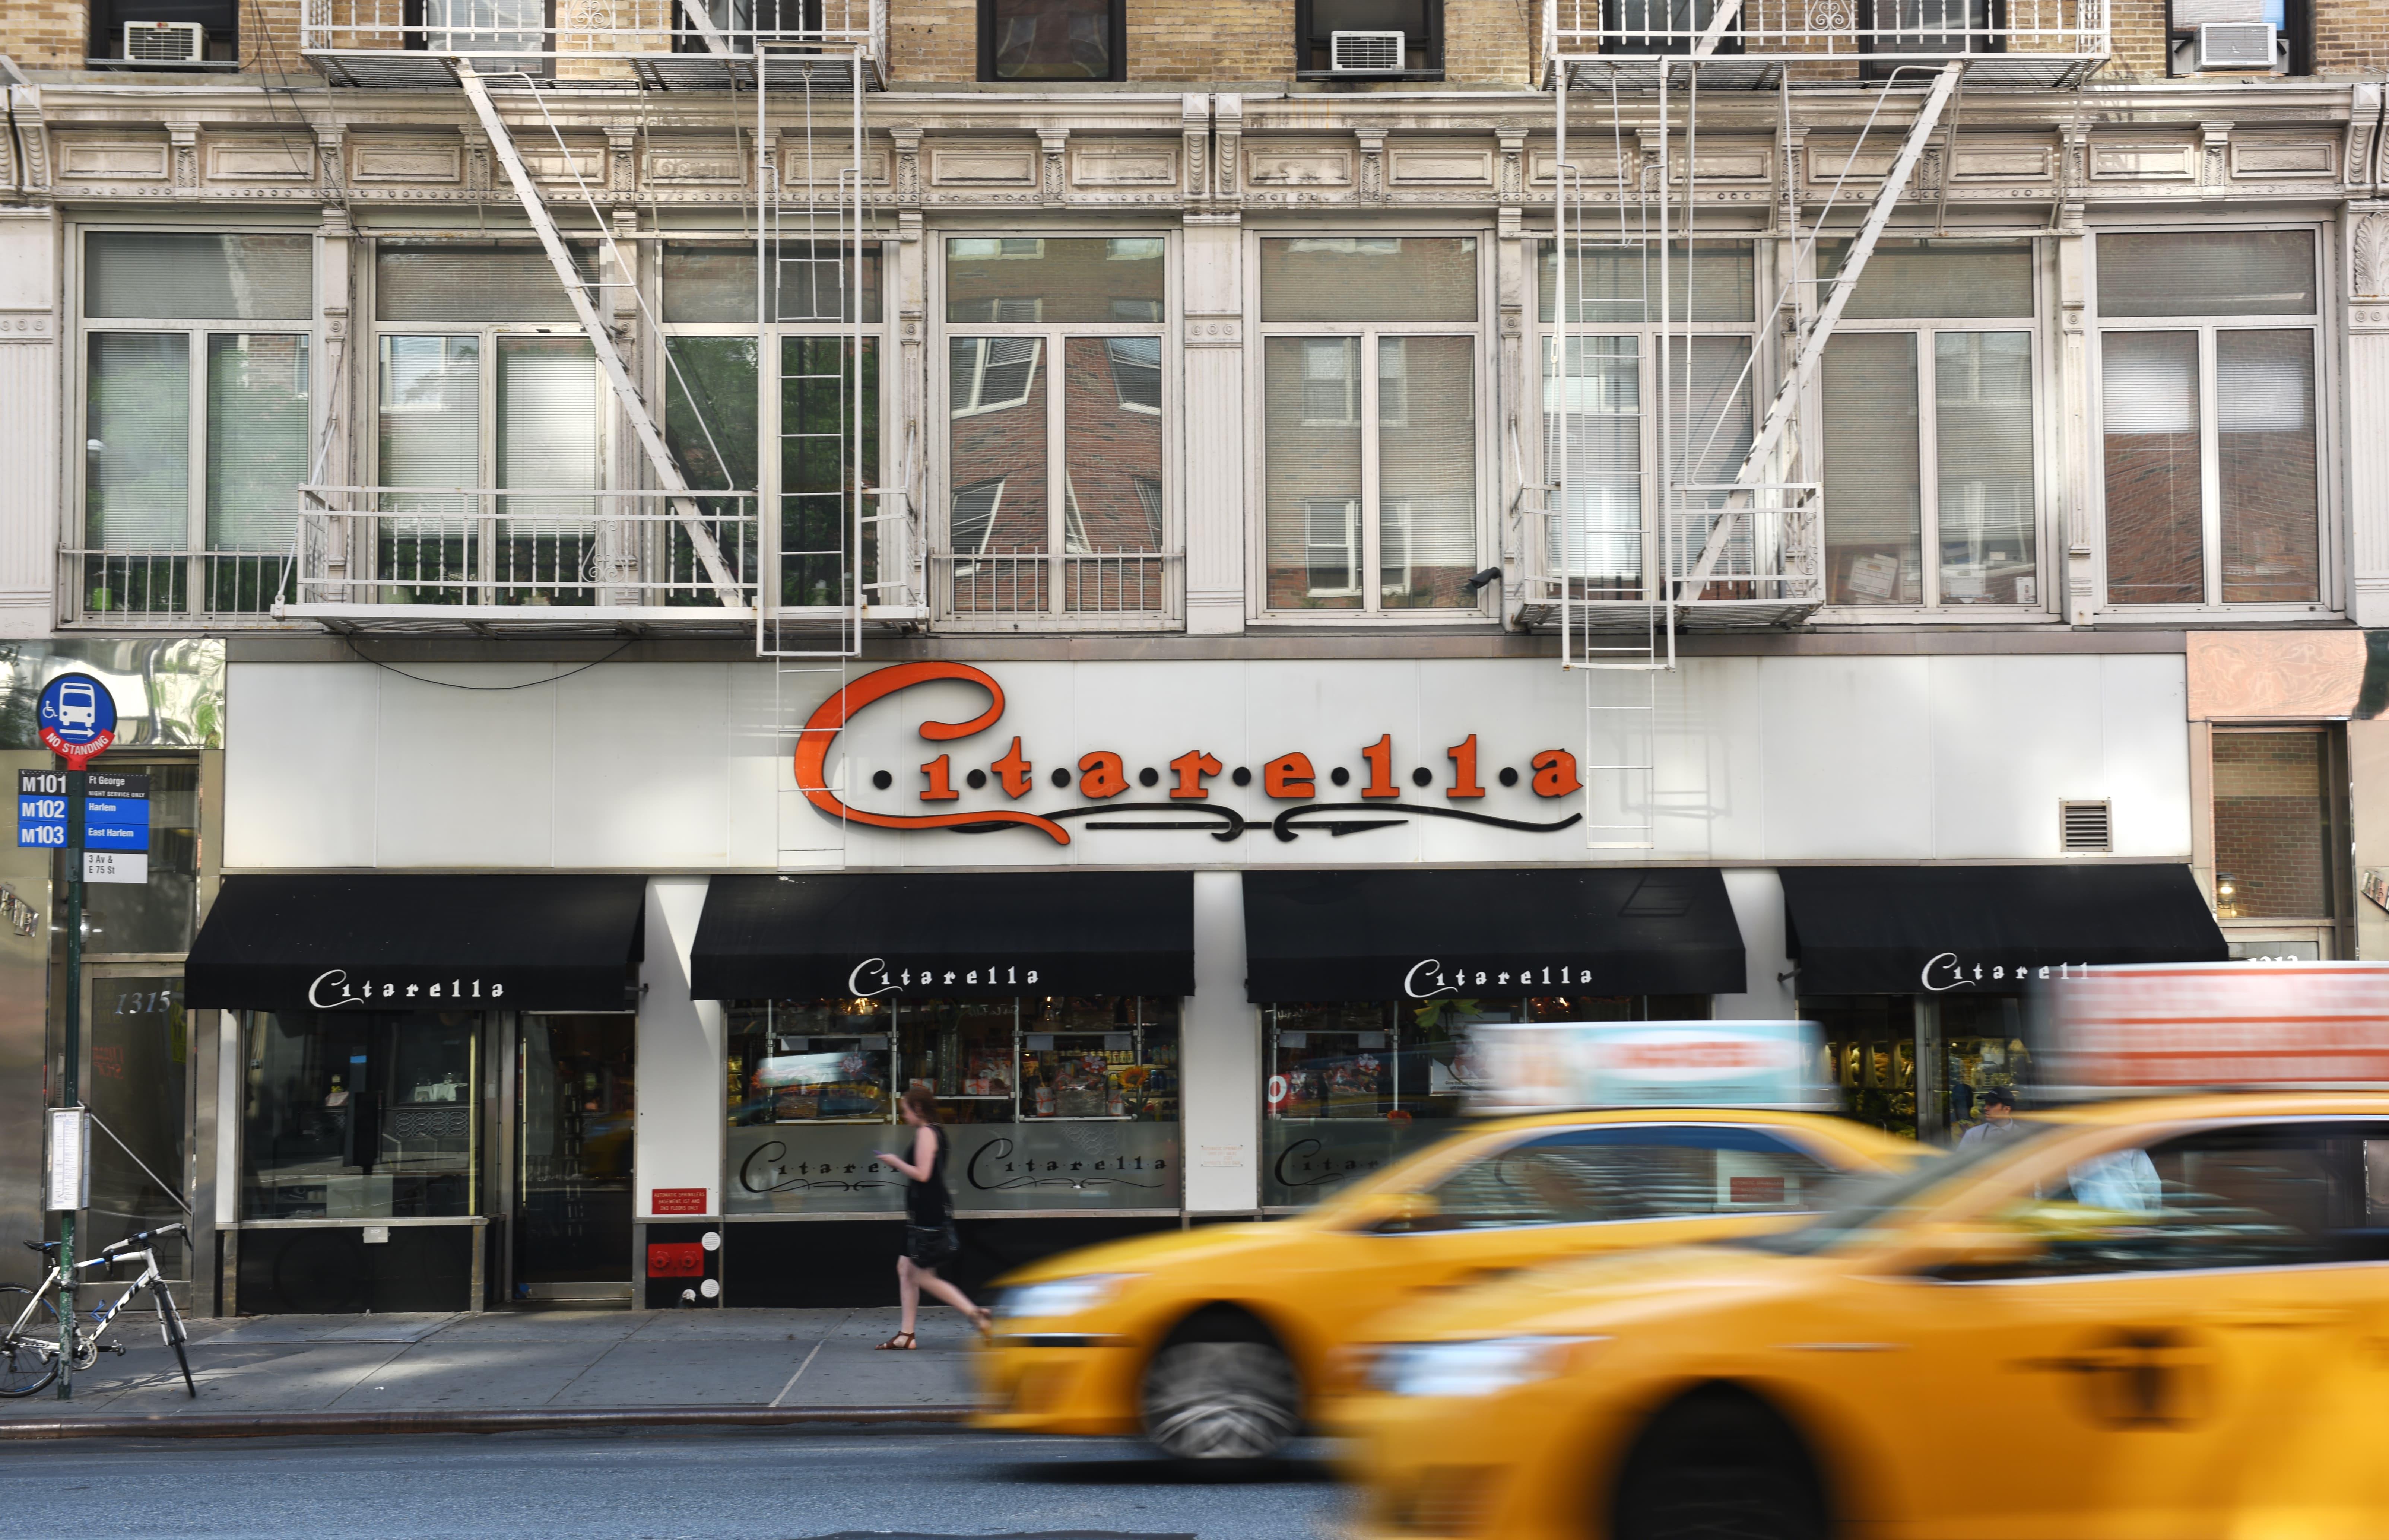 Citarella Gourmet Market - Upper East Side image 13